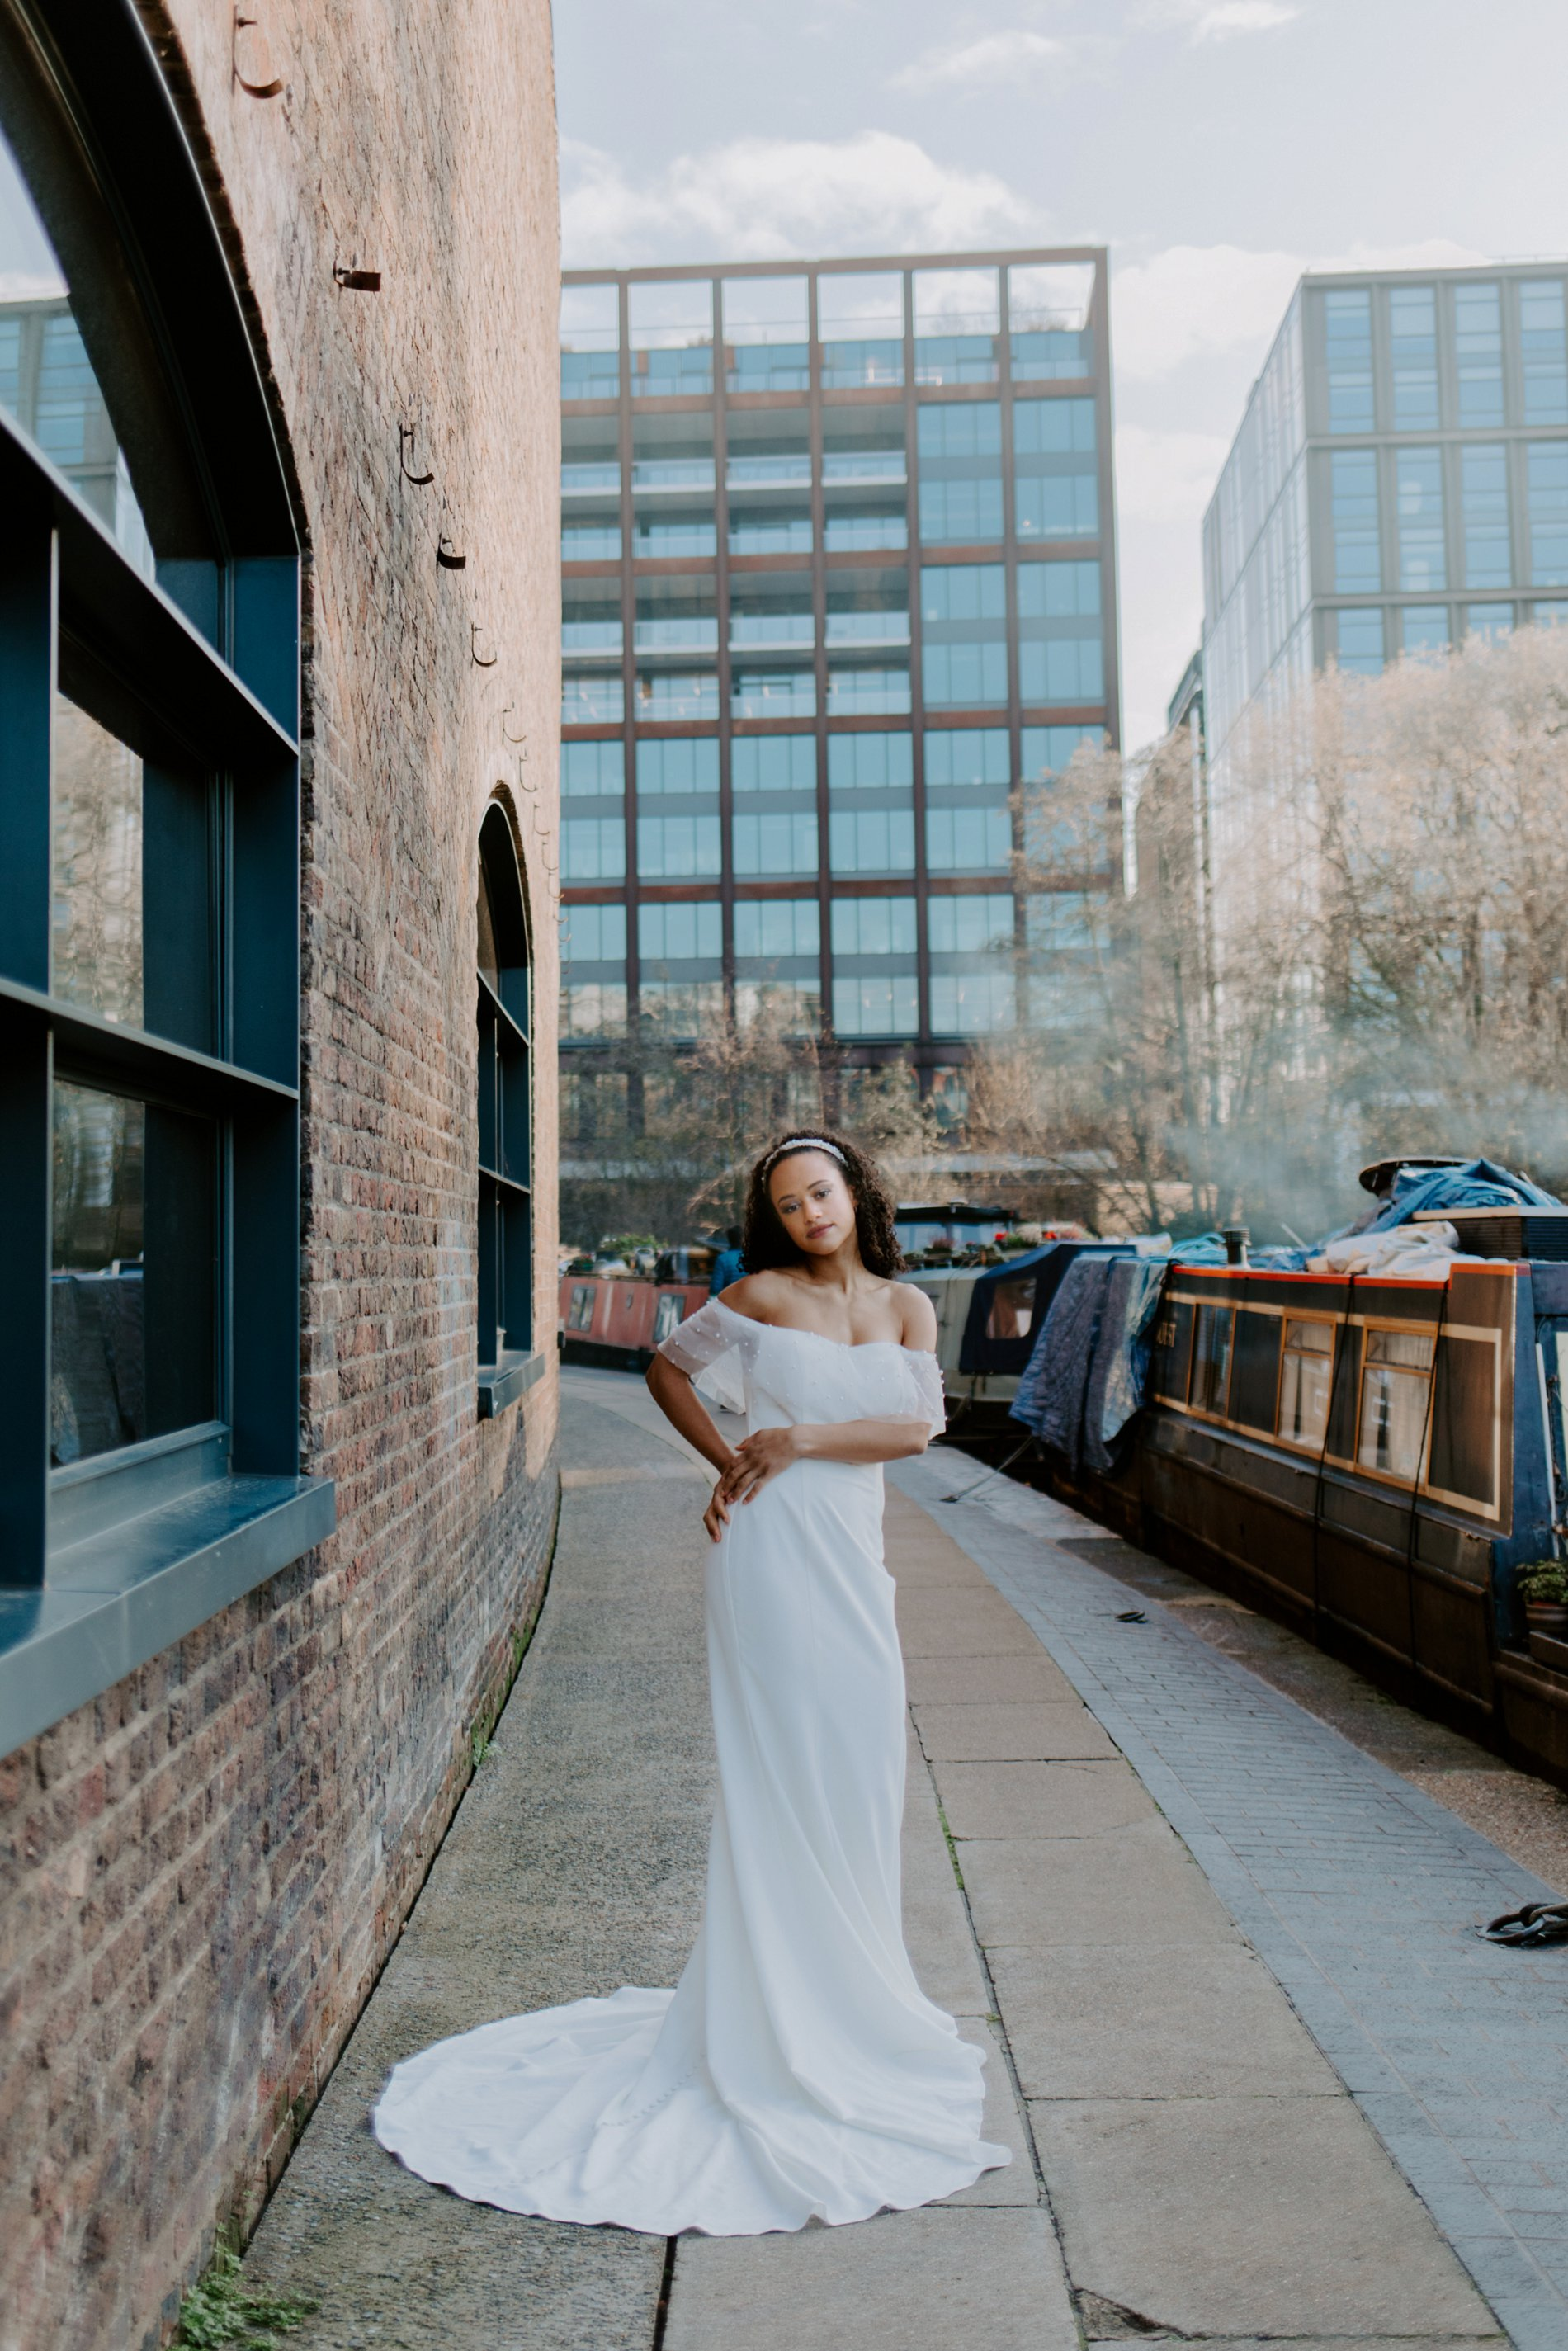 City Wedding Styled Shoot at Coal Drops Yard (c) Emztography (38)